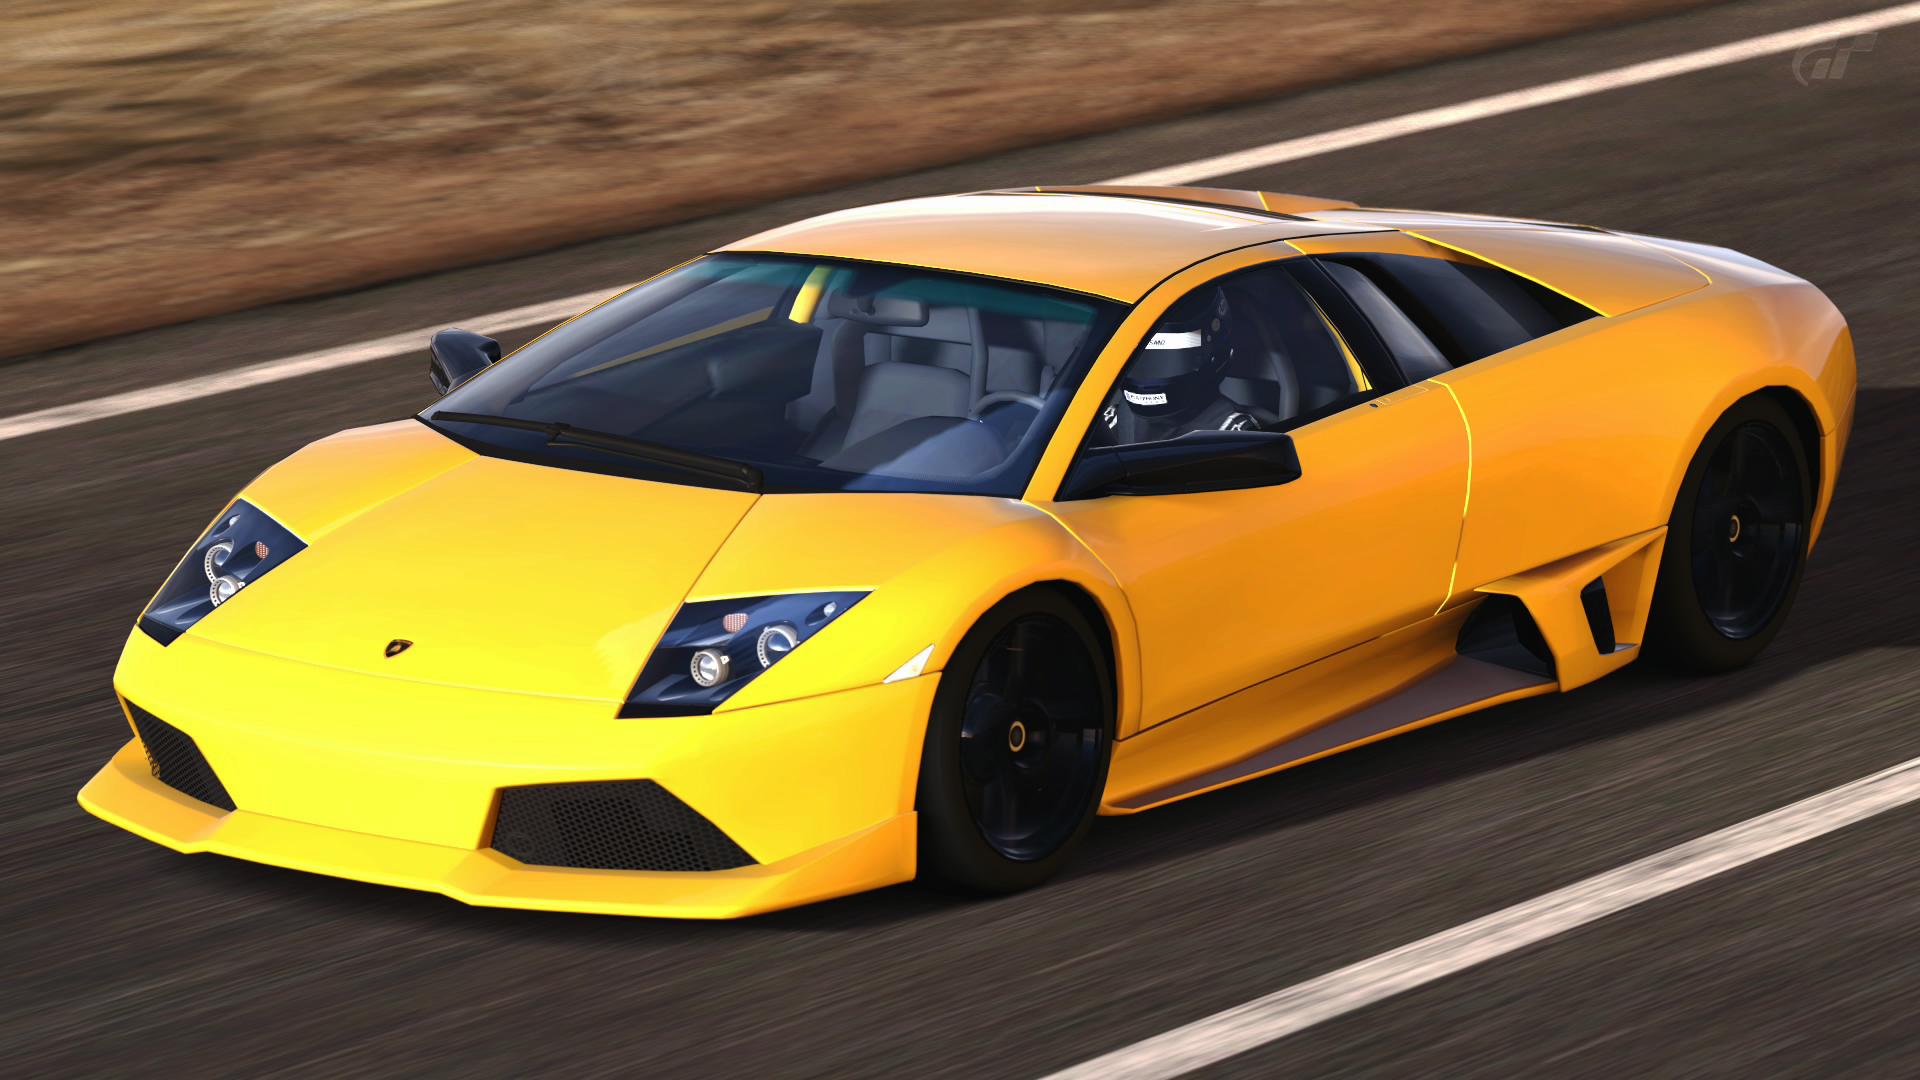 2009 Lamborghini Murcielago Lp640 Gt5 By Vertualissimo